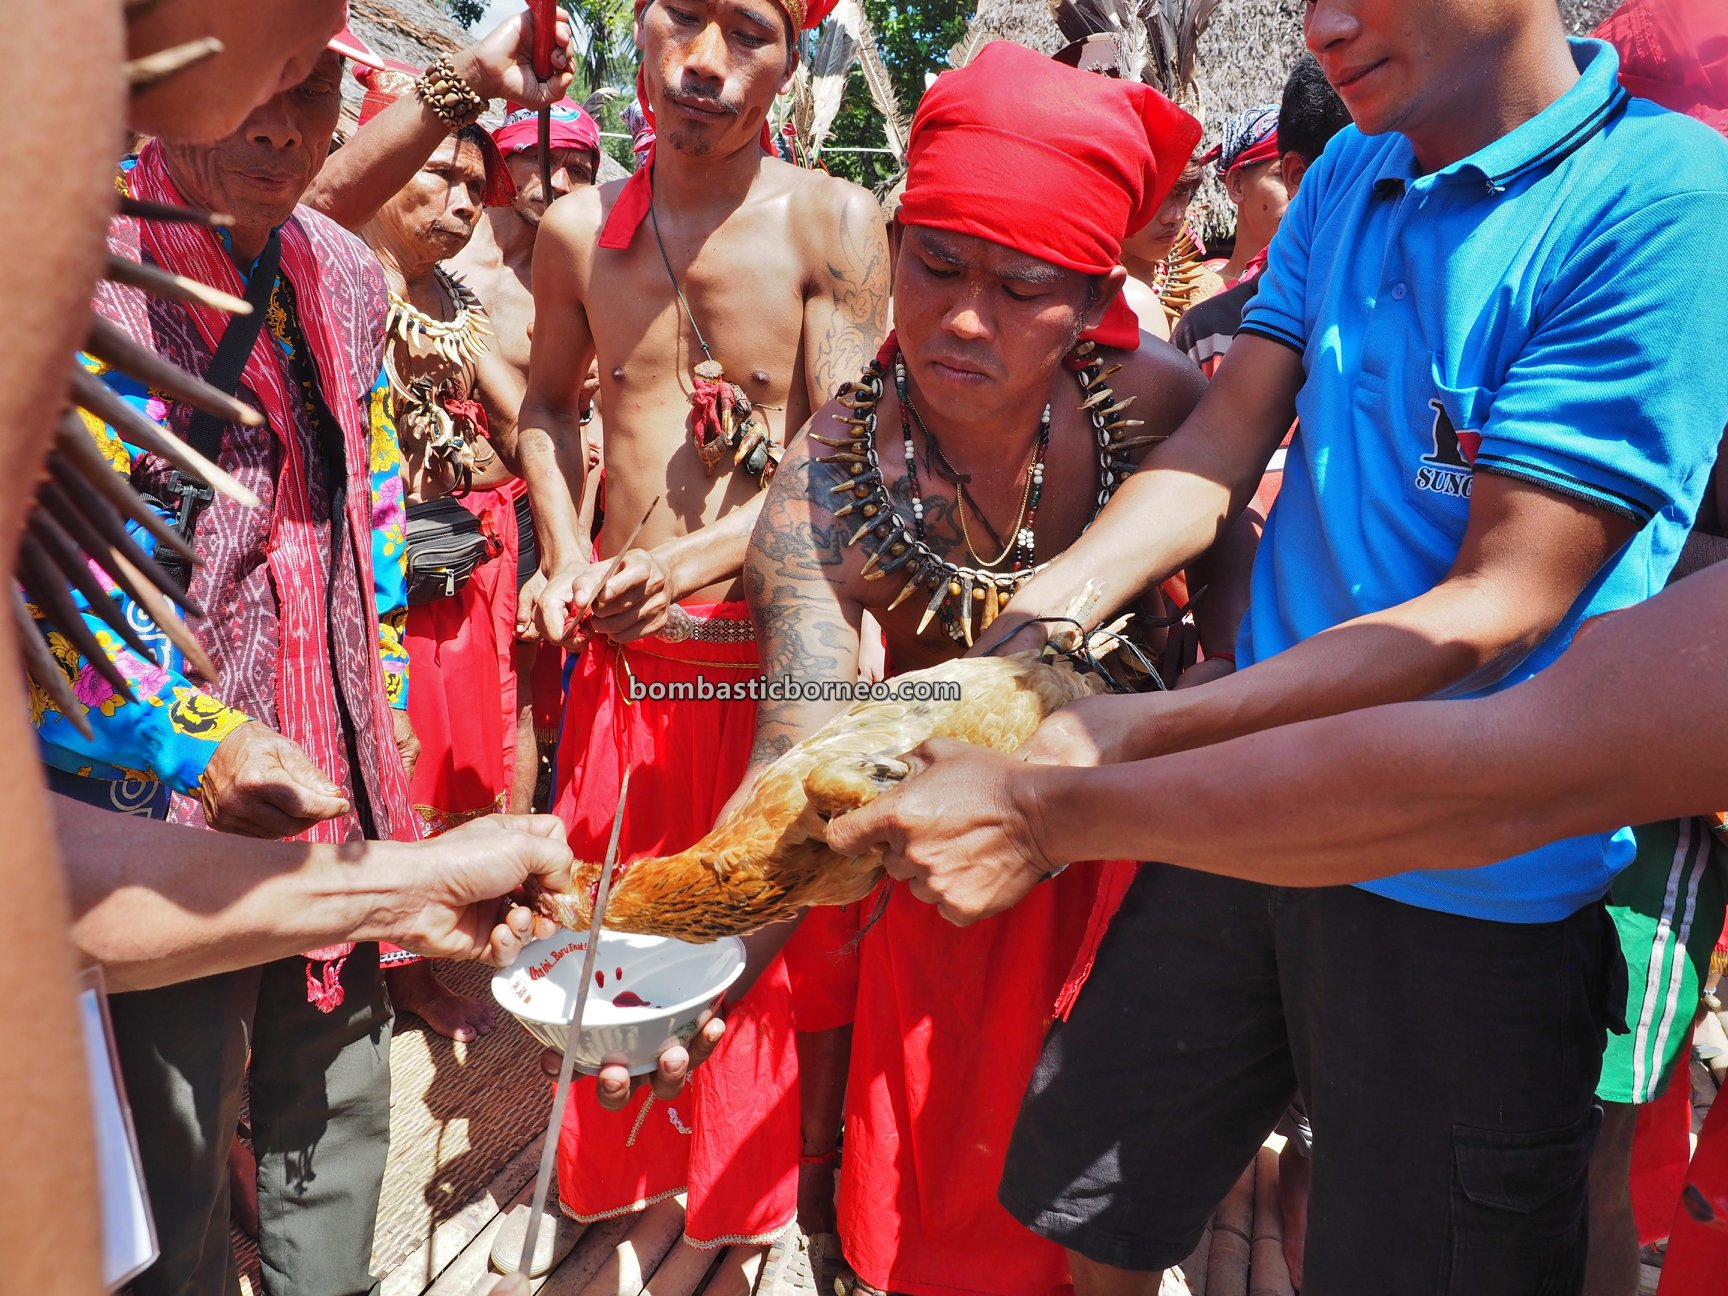 Dusun Medeng, authentic, traditional, wisata budaya, ritual, Bengkayang, Indonesia, native, tribal, Tourism, travel guide, Trans Borneo, 婆罗洲土著部落, 孟加映达雅丰收节日, 原住民传统文化,